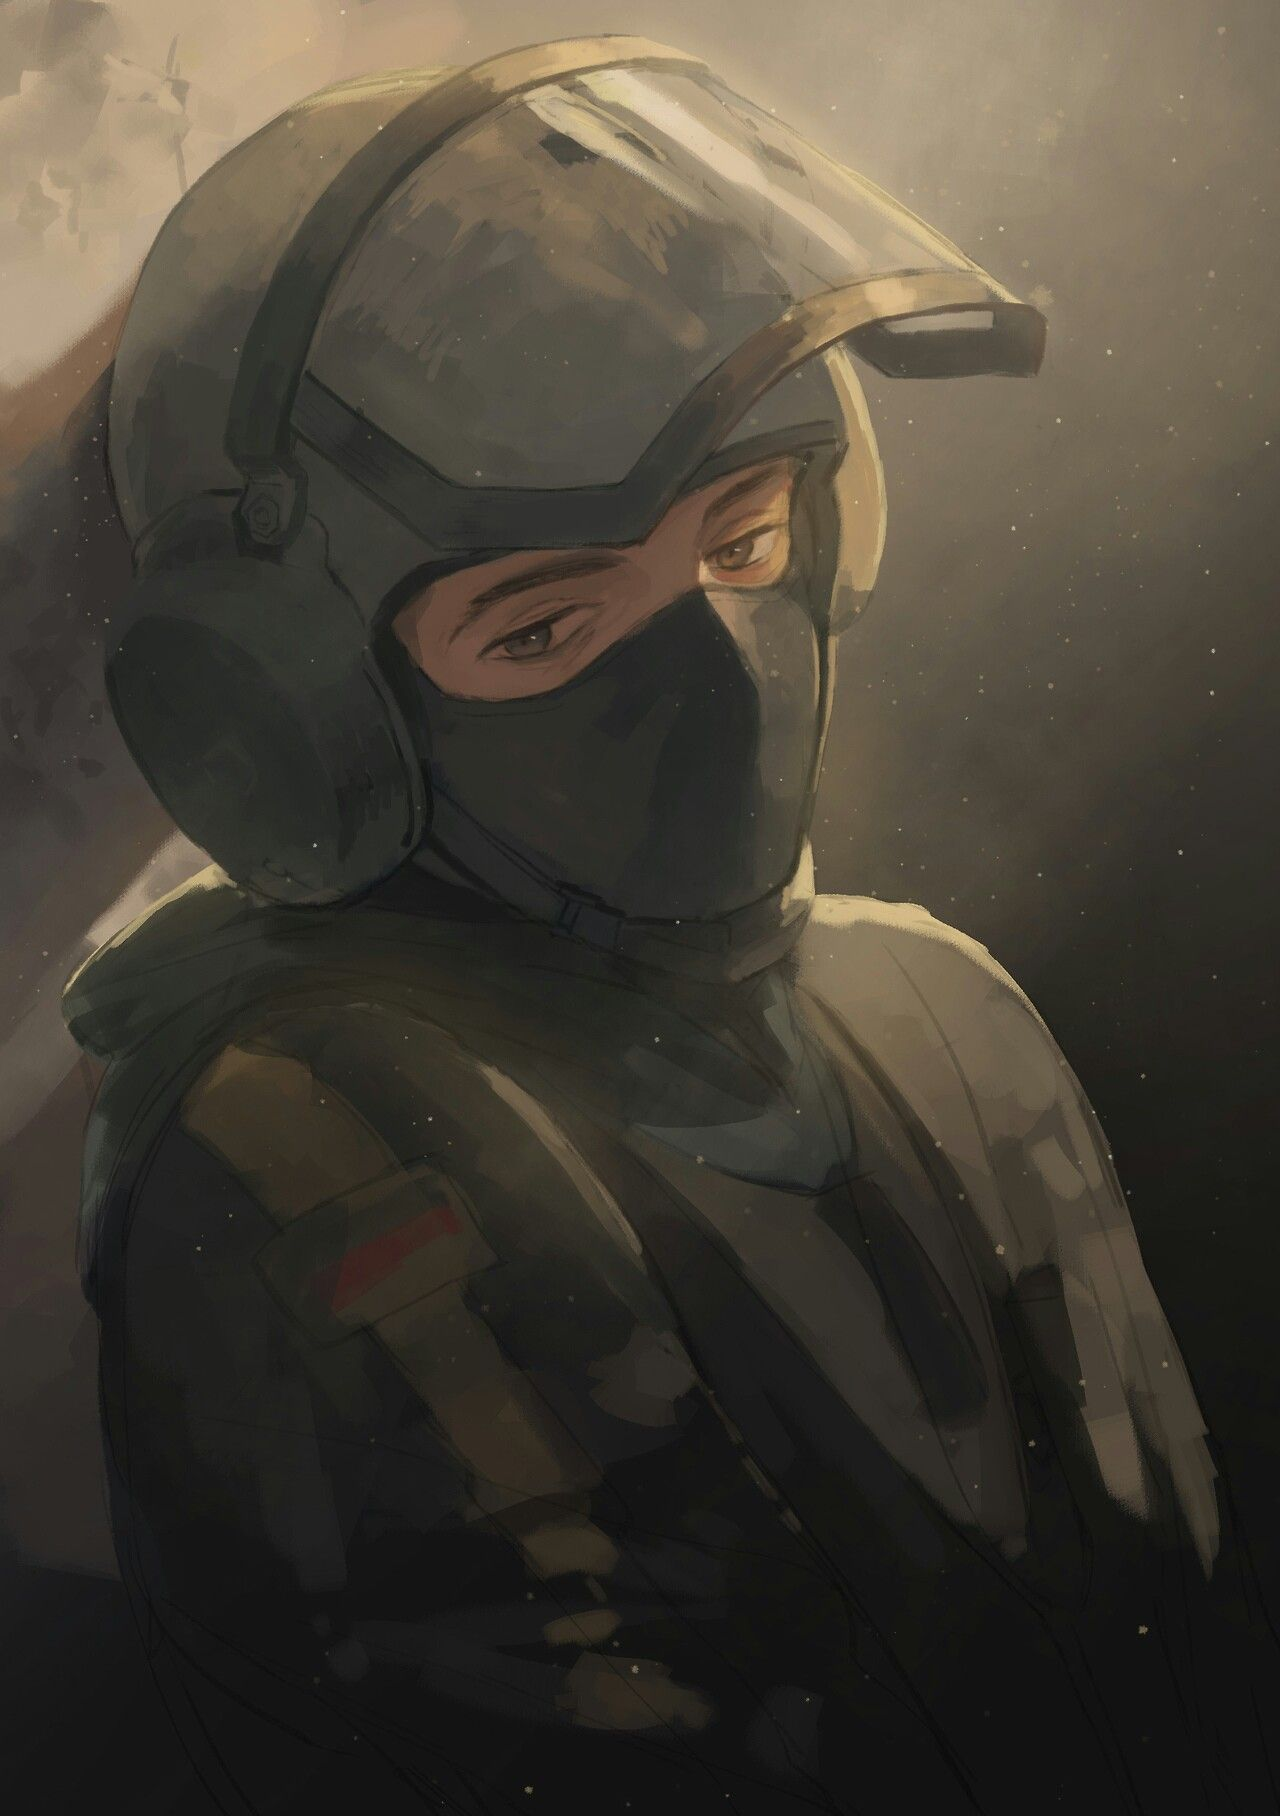 gsg 9 operative bandit rainbow six siege pinterest rainbow six